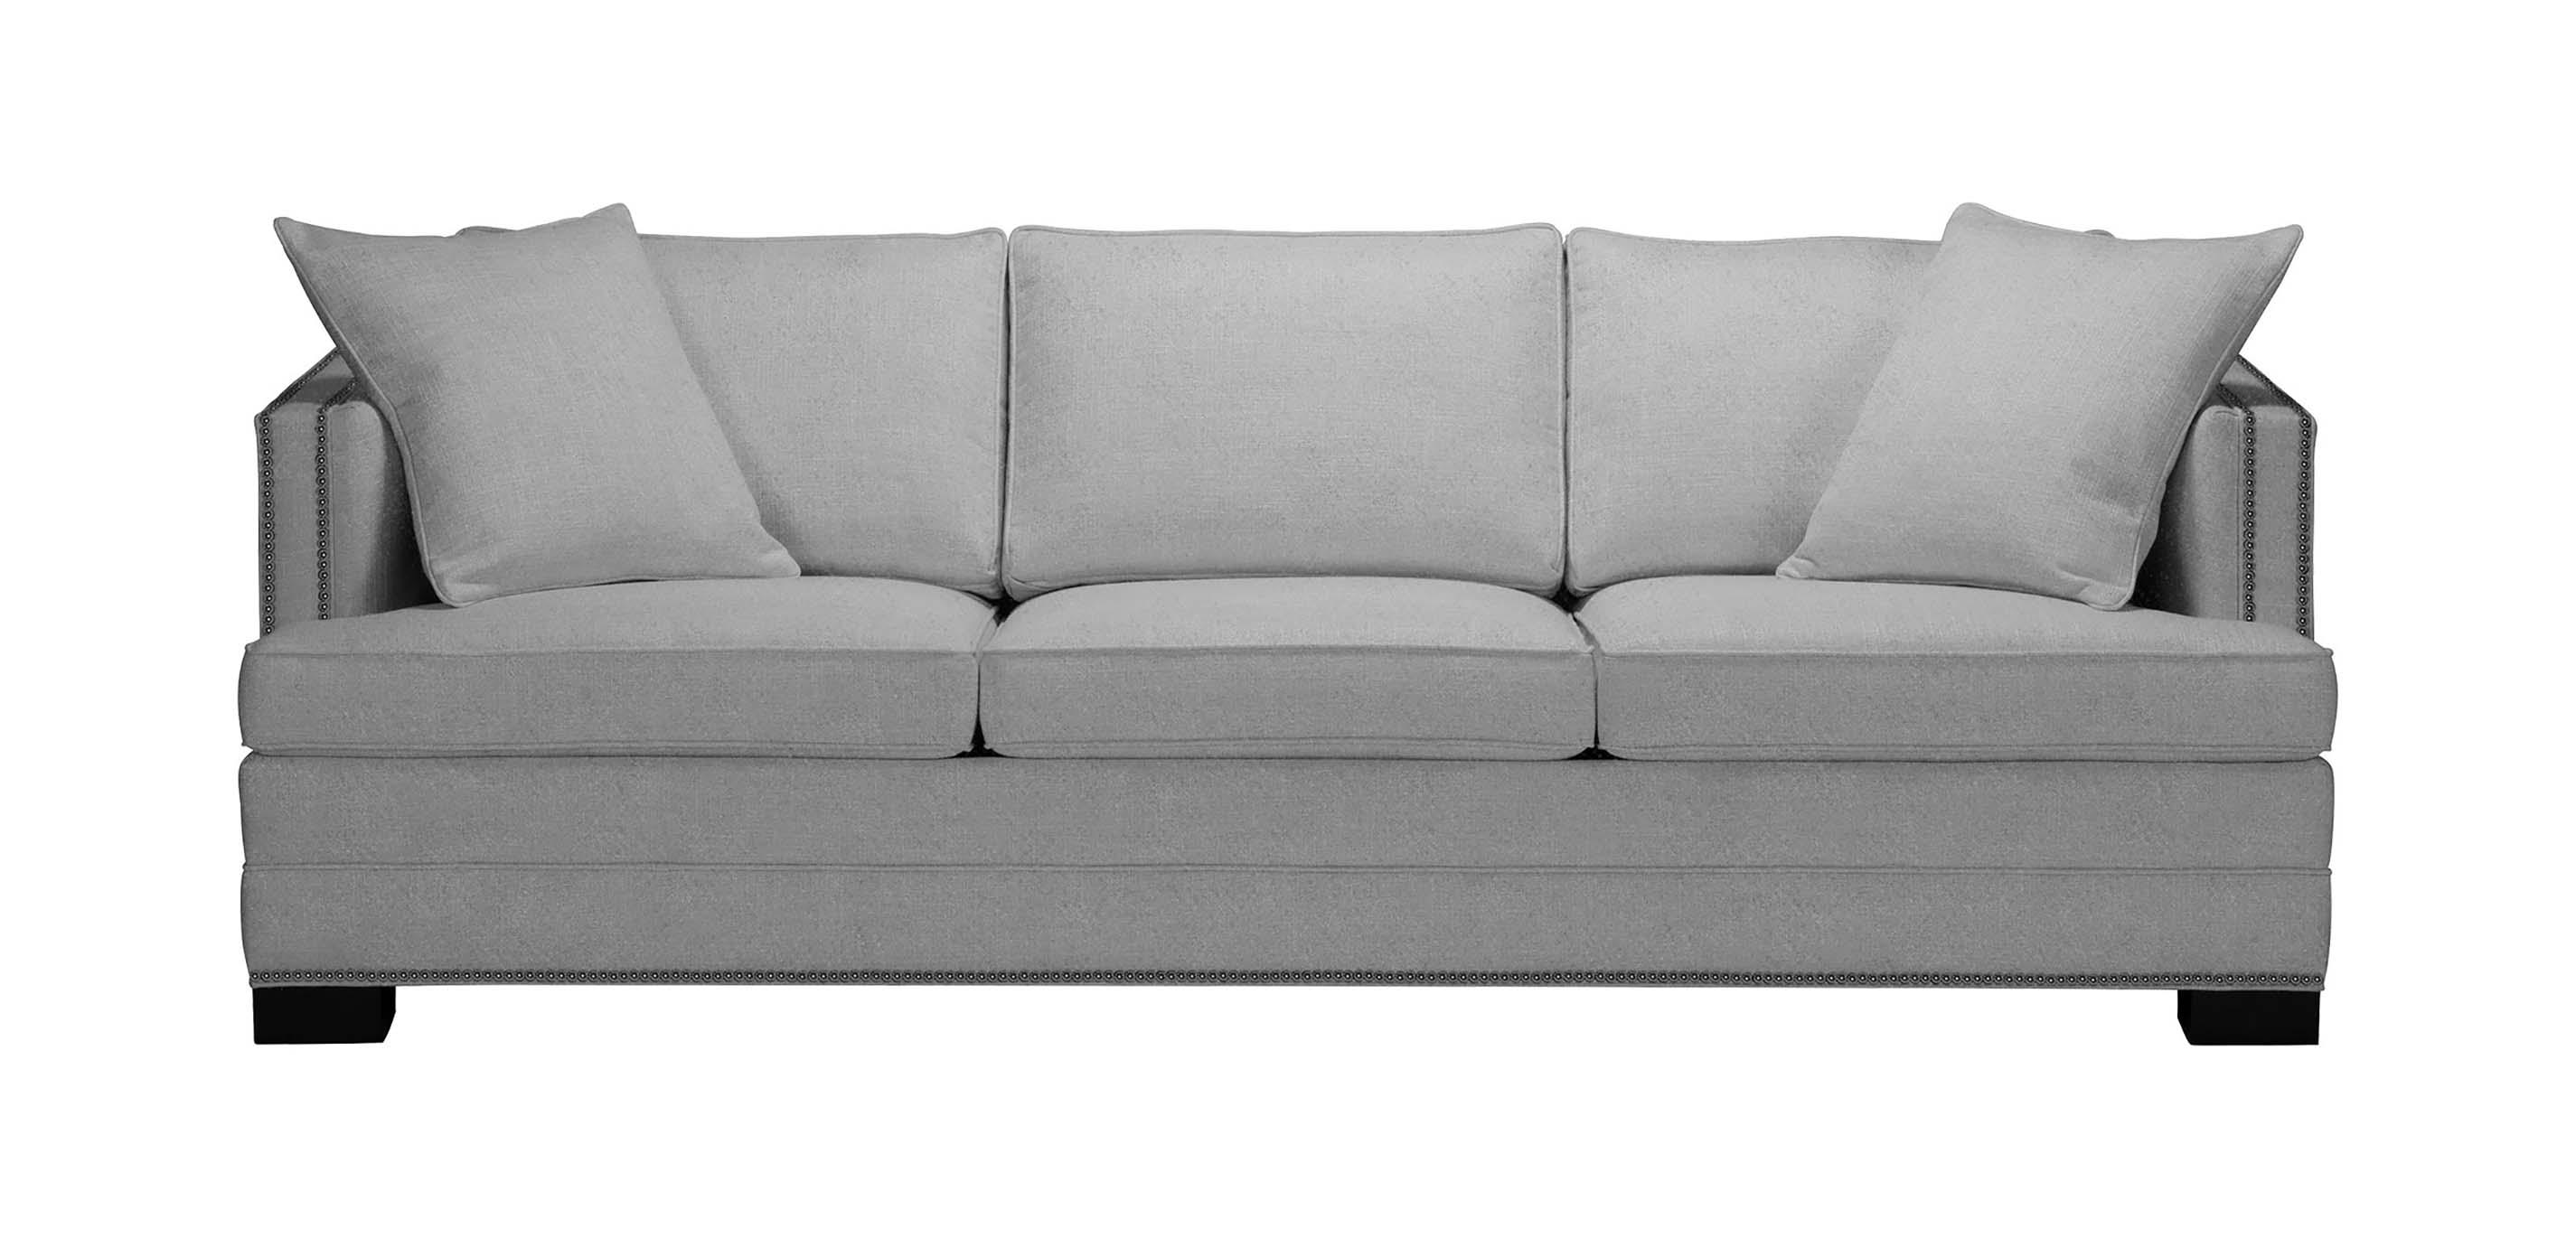 Astor Sofa   Sofas & Loveseats   Ethan Allen